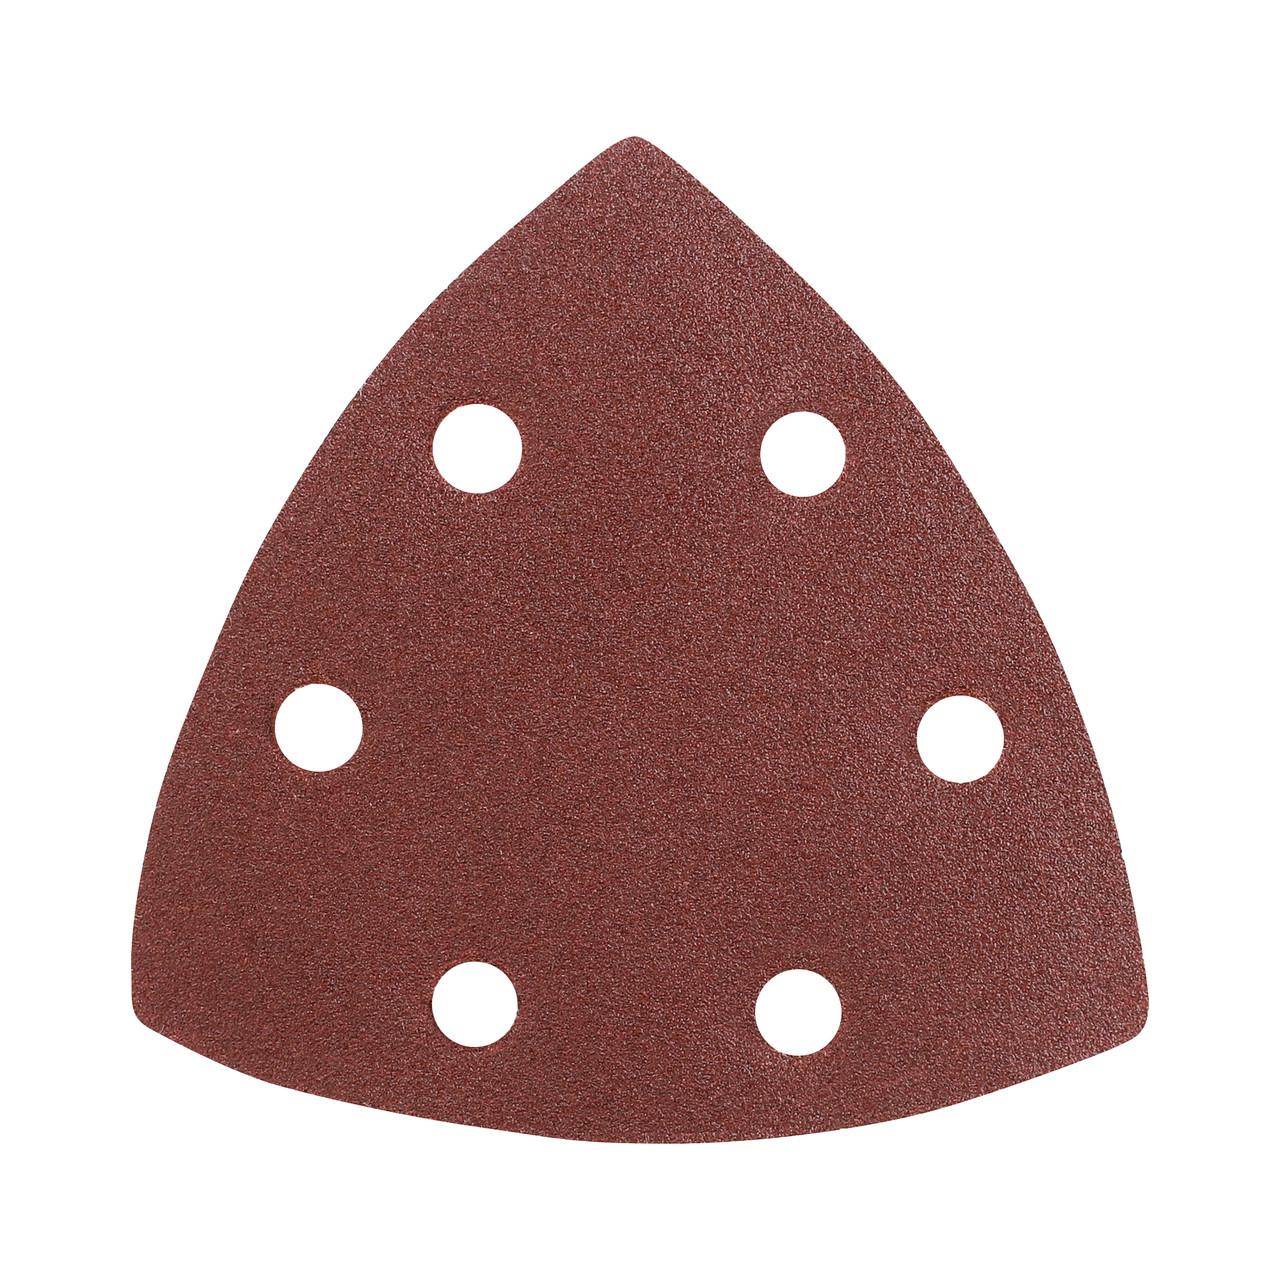 Треугольник шлифовальный PATRIOT на липучке, 80х80х80мм, Р120, 5 шт